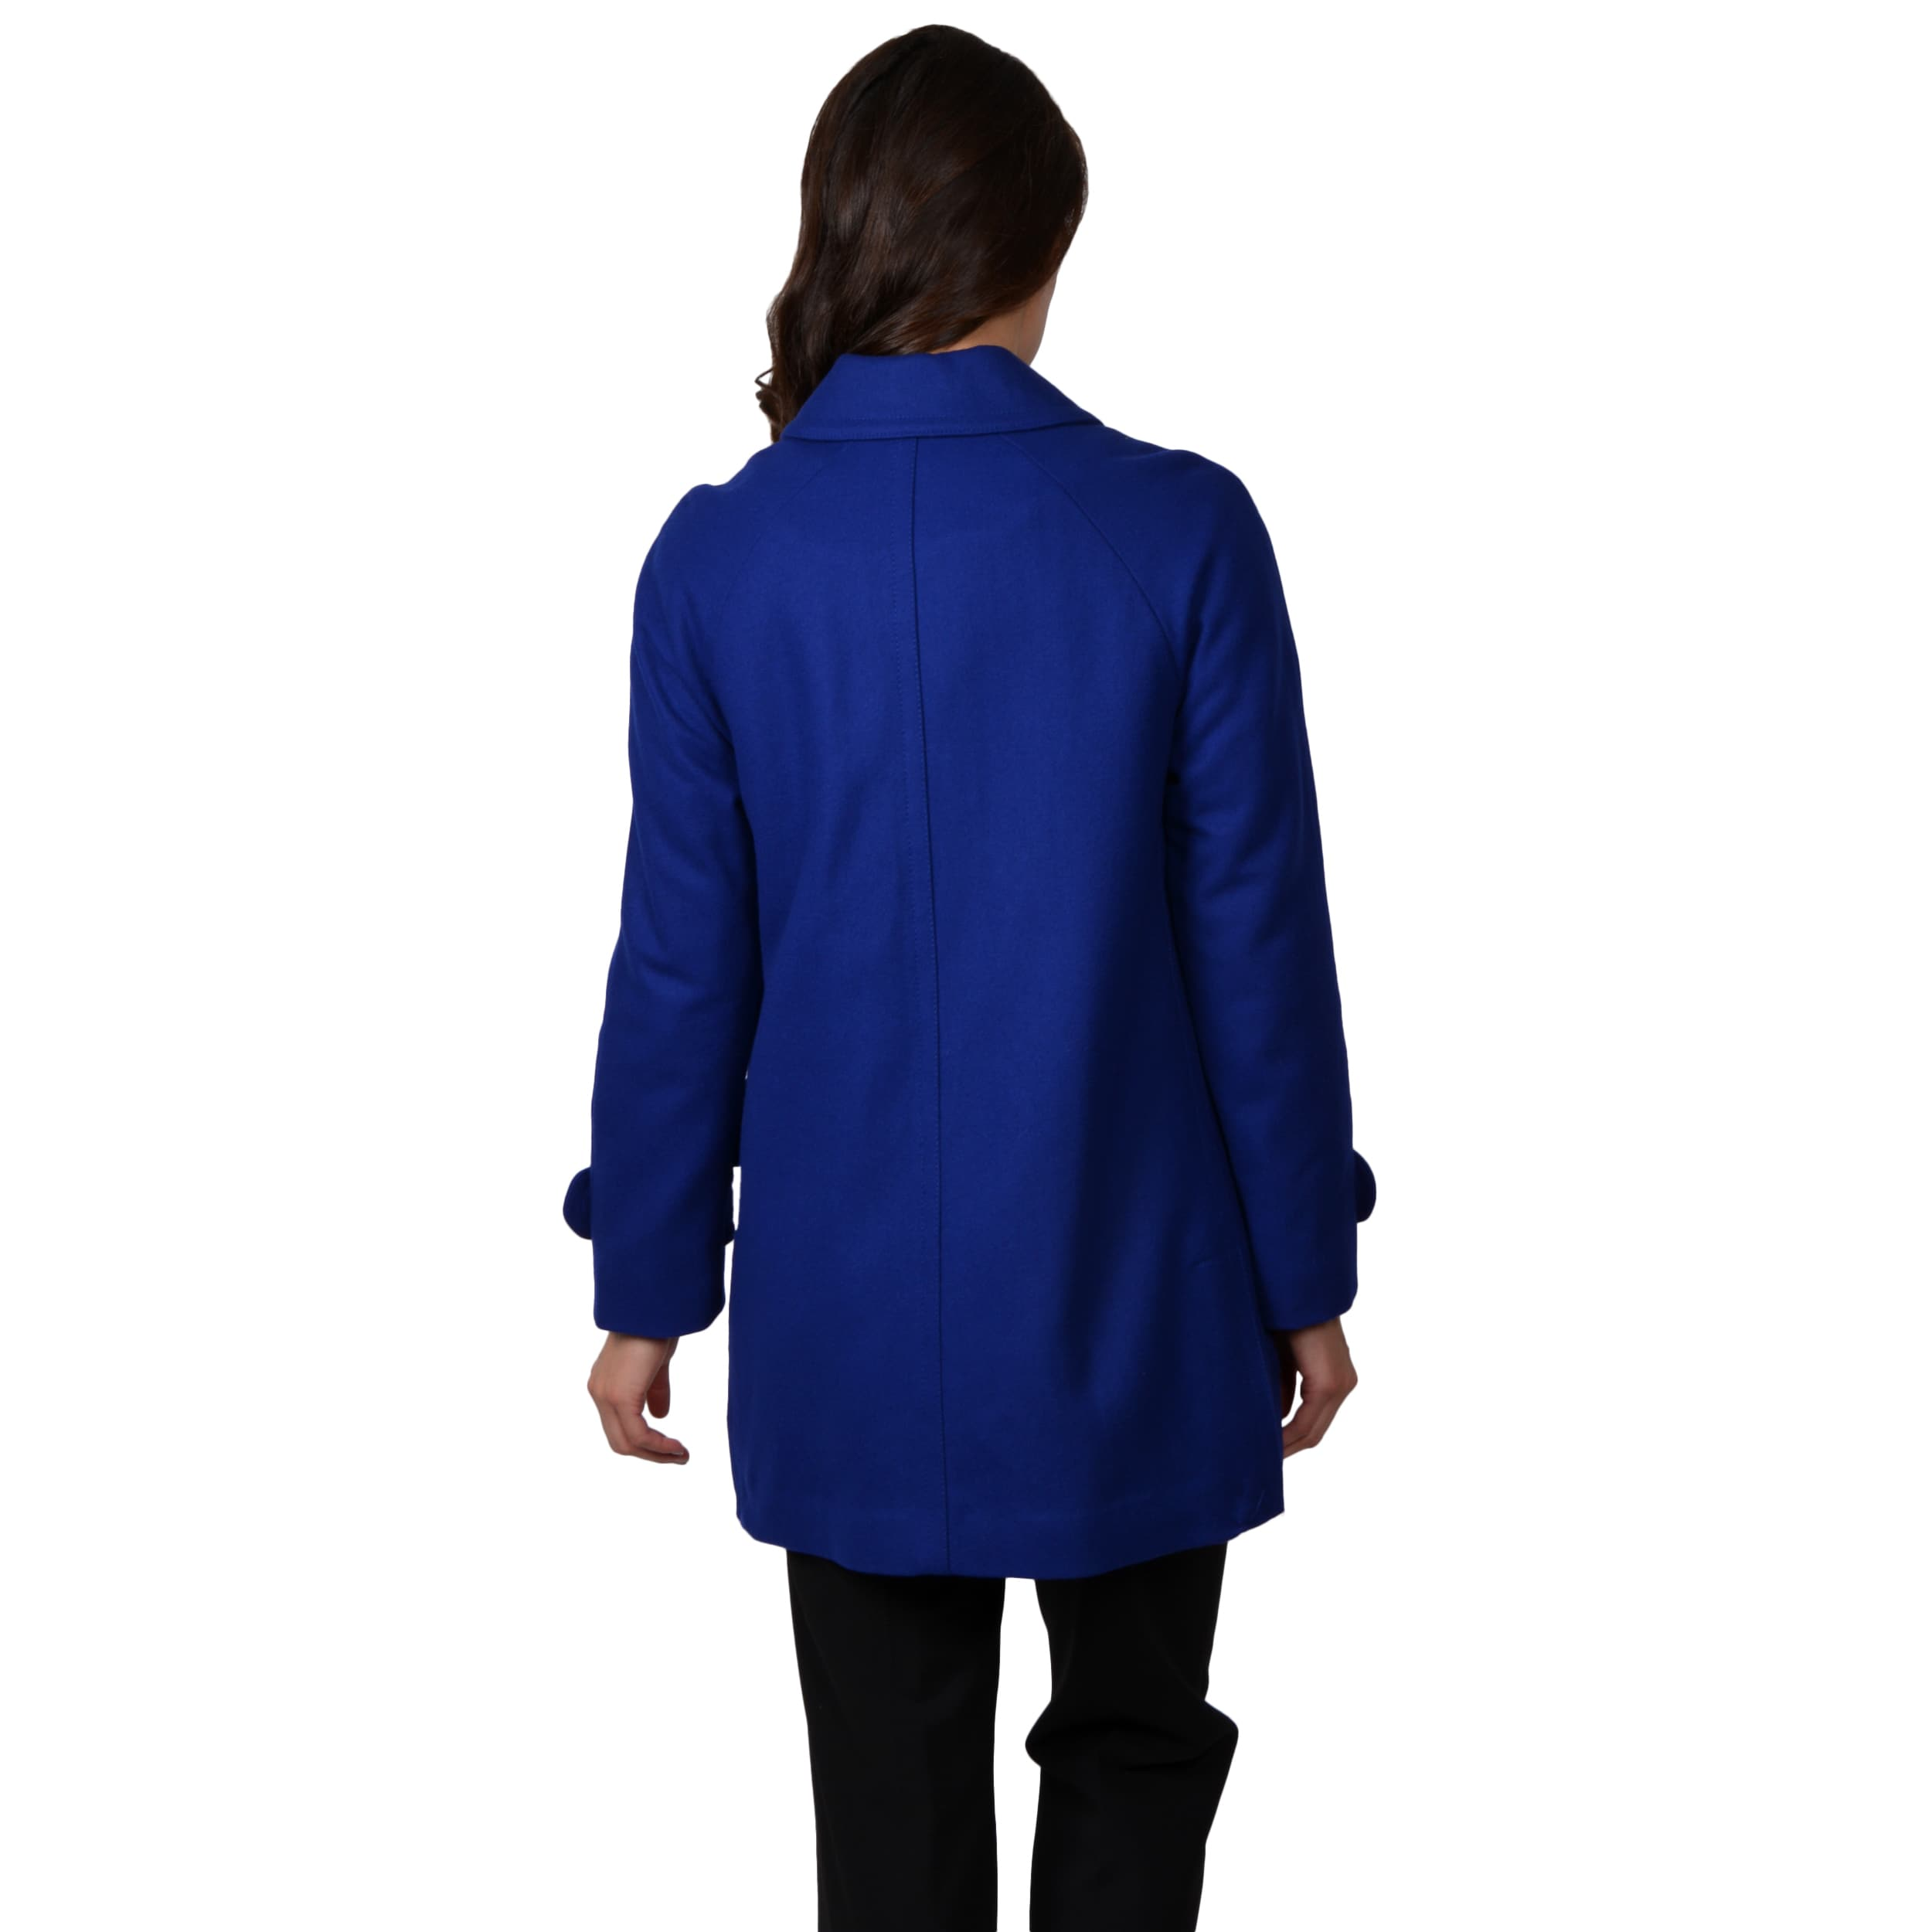 ed376ef0380 Shop Ellen Tracy Women s Wool Blend Stadium Coat - Free Shipping Today -  Overstock - 8386069